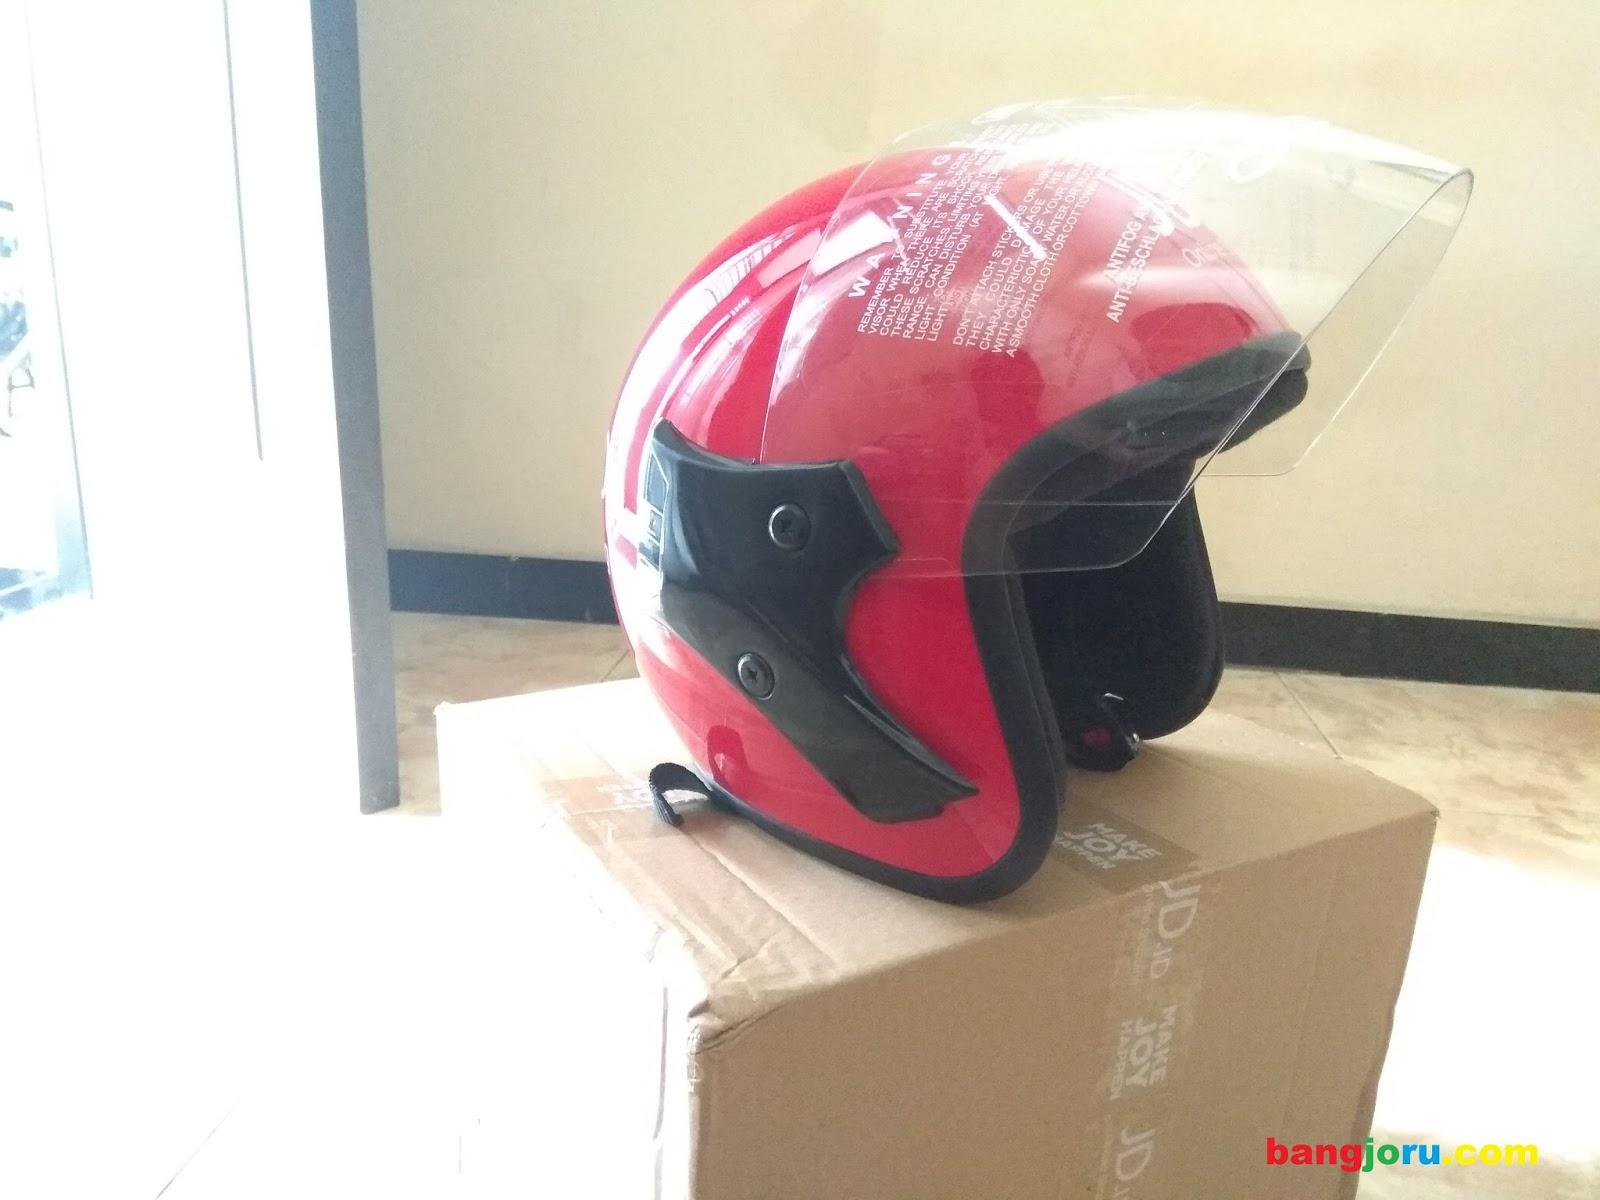 Bangjoru Review Helm Jd Joy Helmet Mungil Yang Lumayan Kaca Spion Sepeda